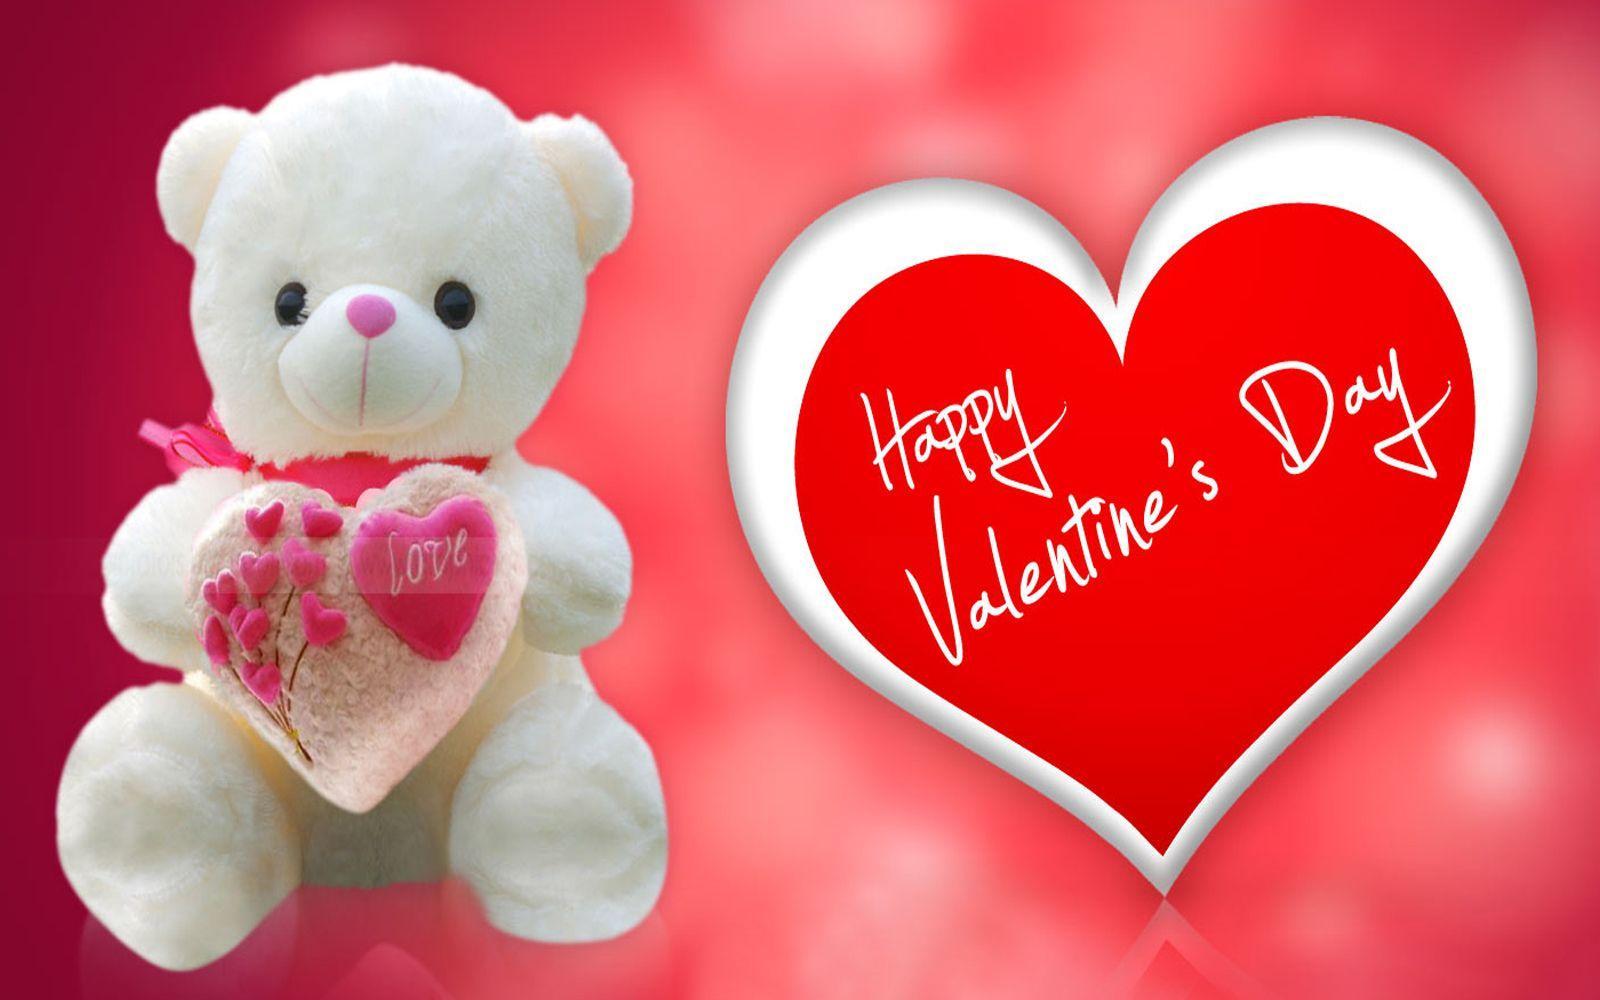 1600x1000 Happy Valentines Day Image, HD Wallpaper, Photo & Pics, Whatsapp